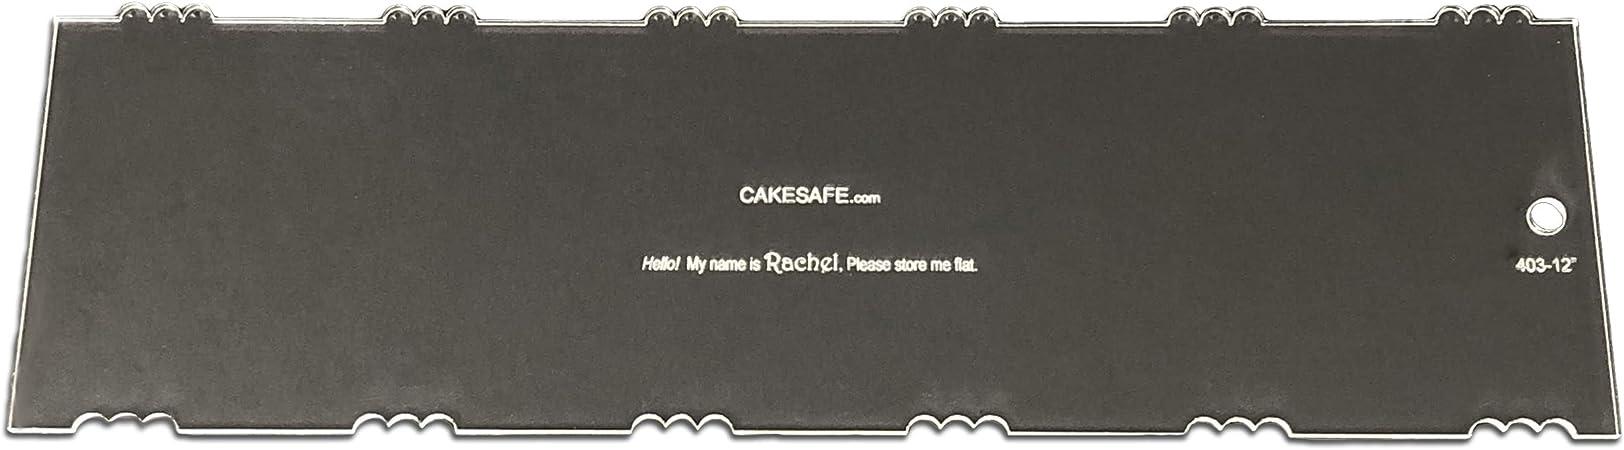 "CakeSafe Rachel Cake Comb 12/"""